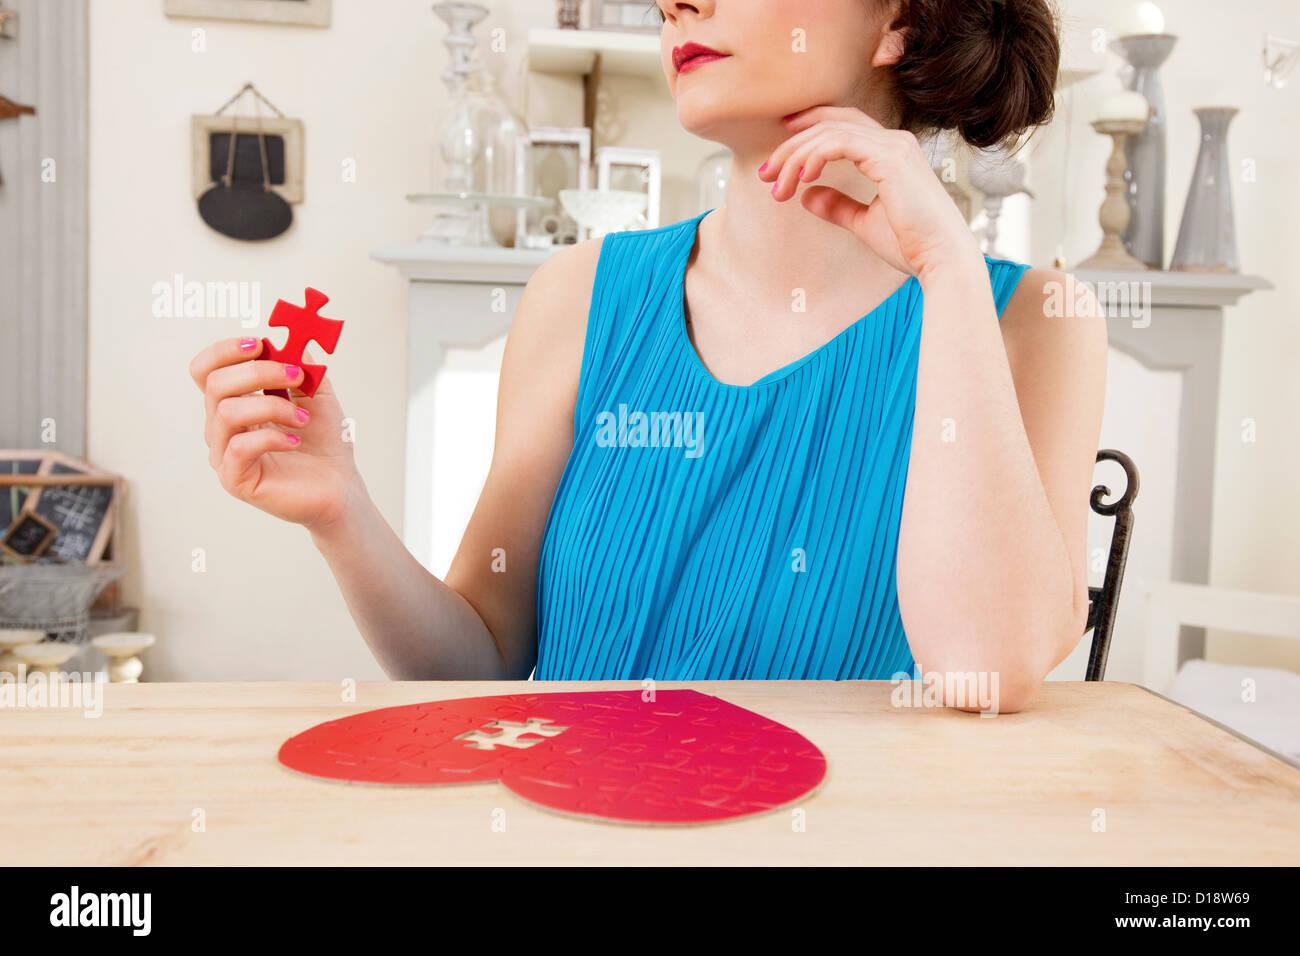 Frau tut Herz geformt Jigsaw Puzzle Stück Stockfoto